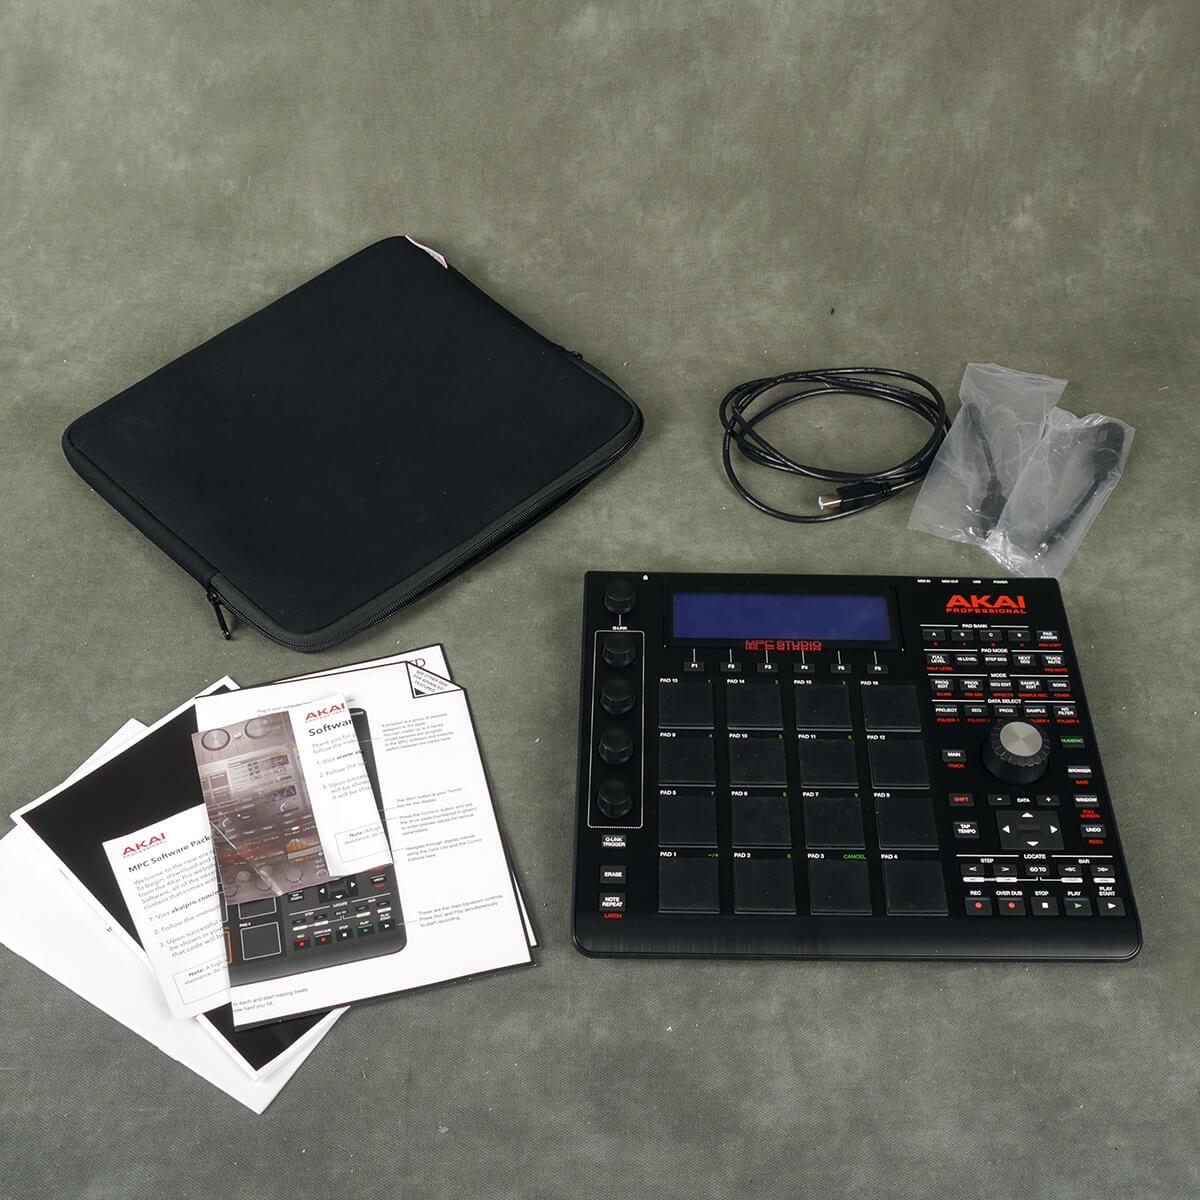 Akai MPC Studio Production Controller w/Soft Case - 2nd Hand